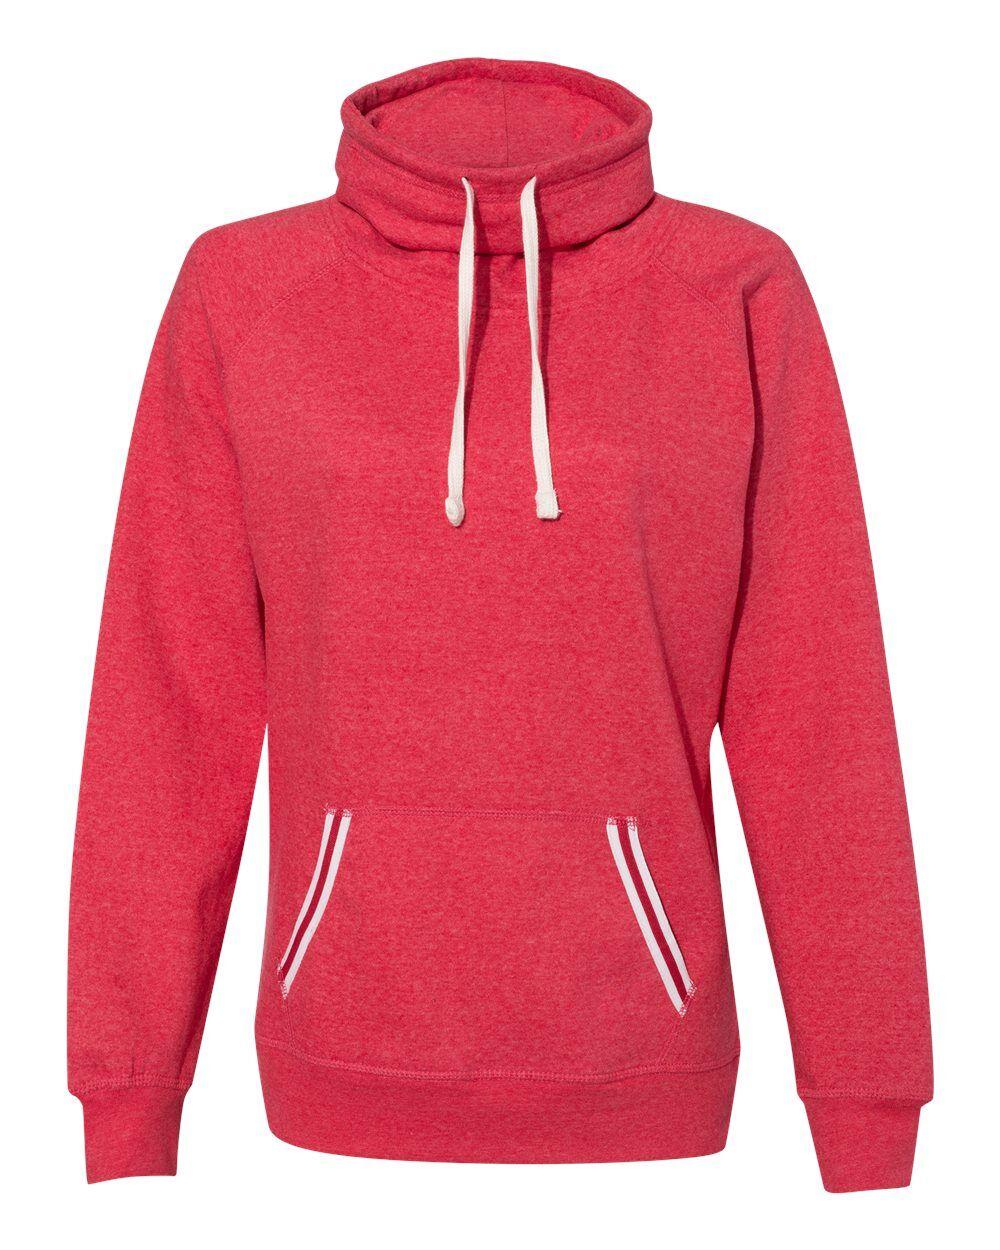 J. America - Womens Relay Cowl Neck Sweatshirt - 8653 - Red - 2X-Large